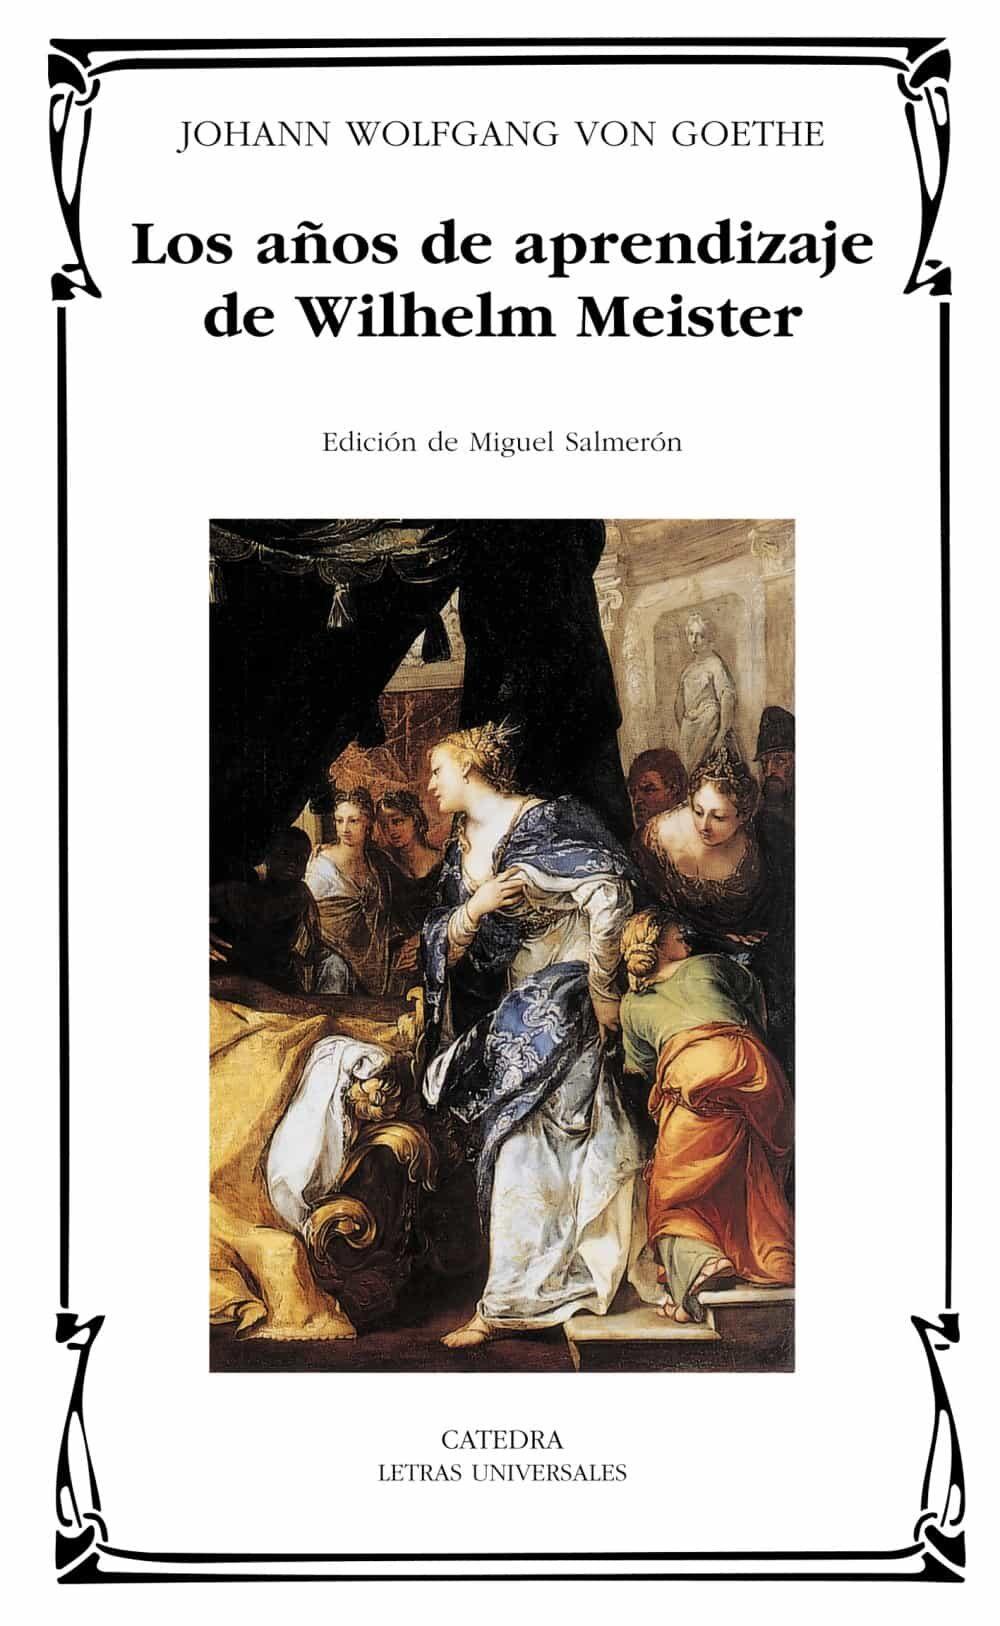 Los Años De Aprendizaje De Wilhelm Meister por Johann Wolfgang Von Goethe